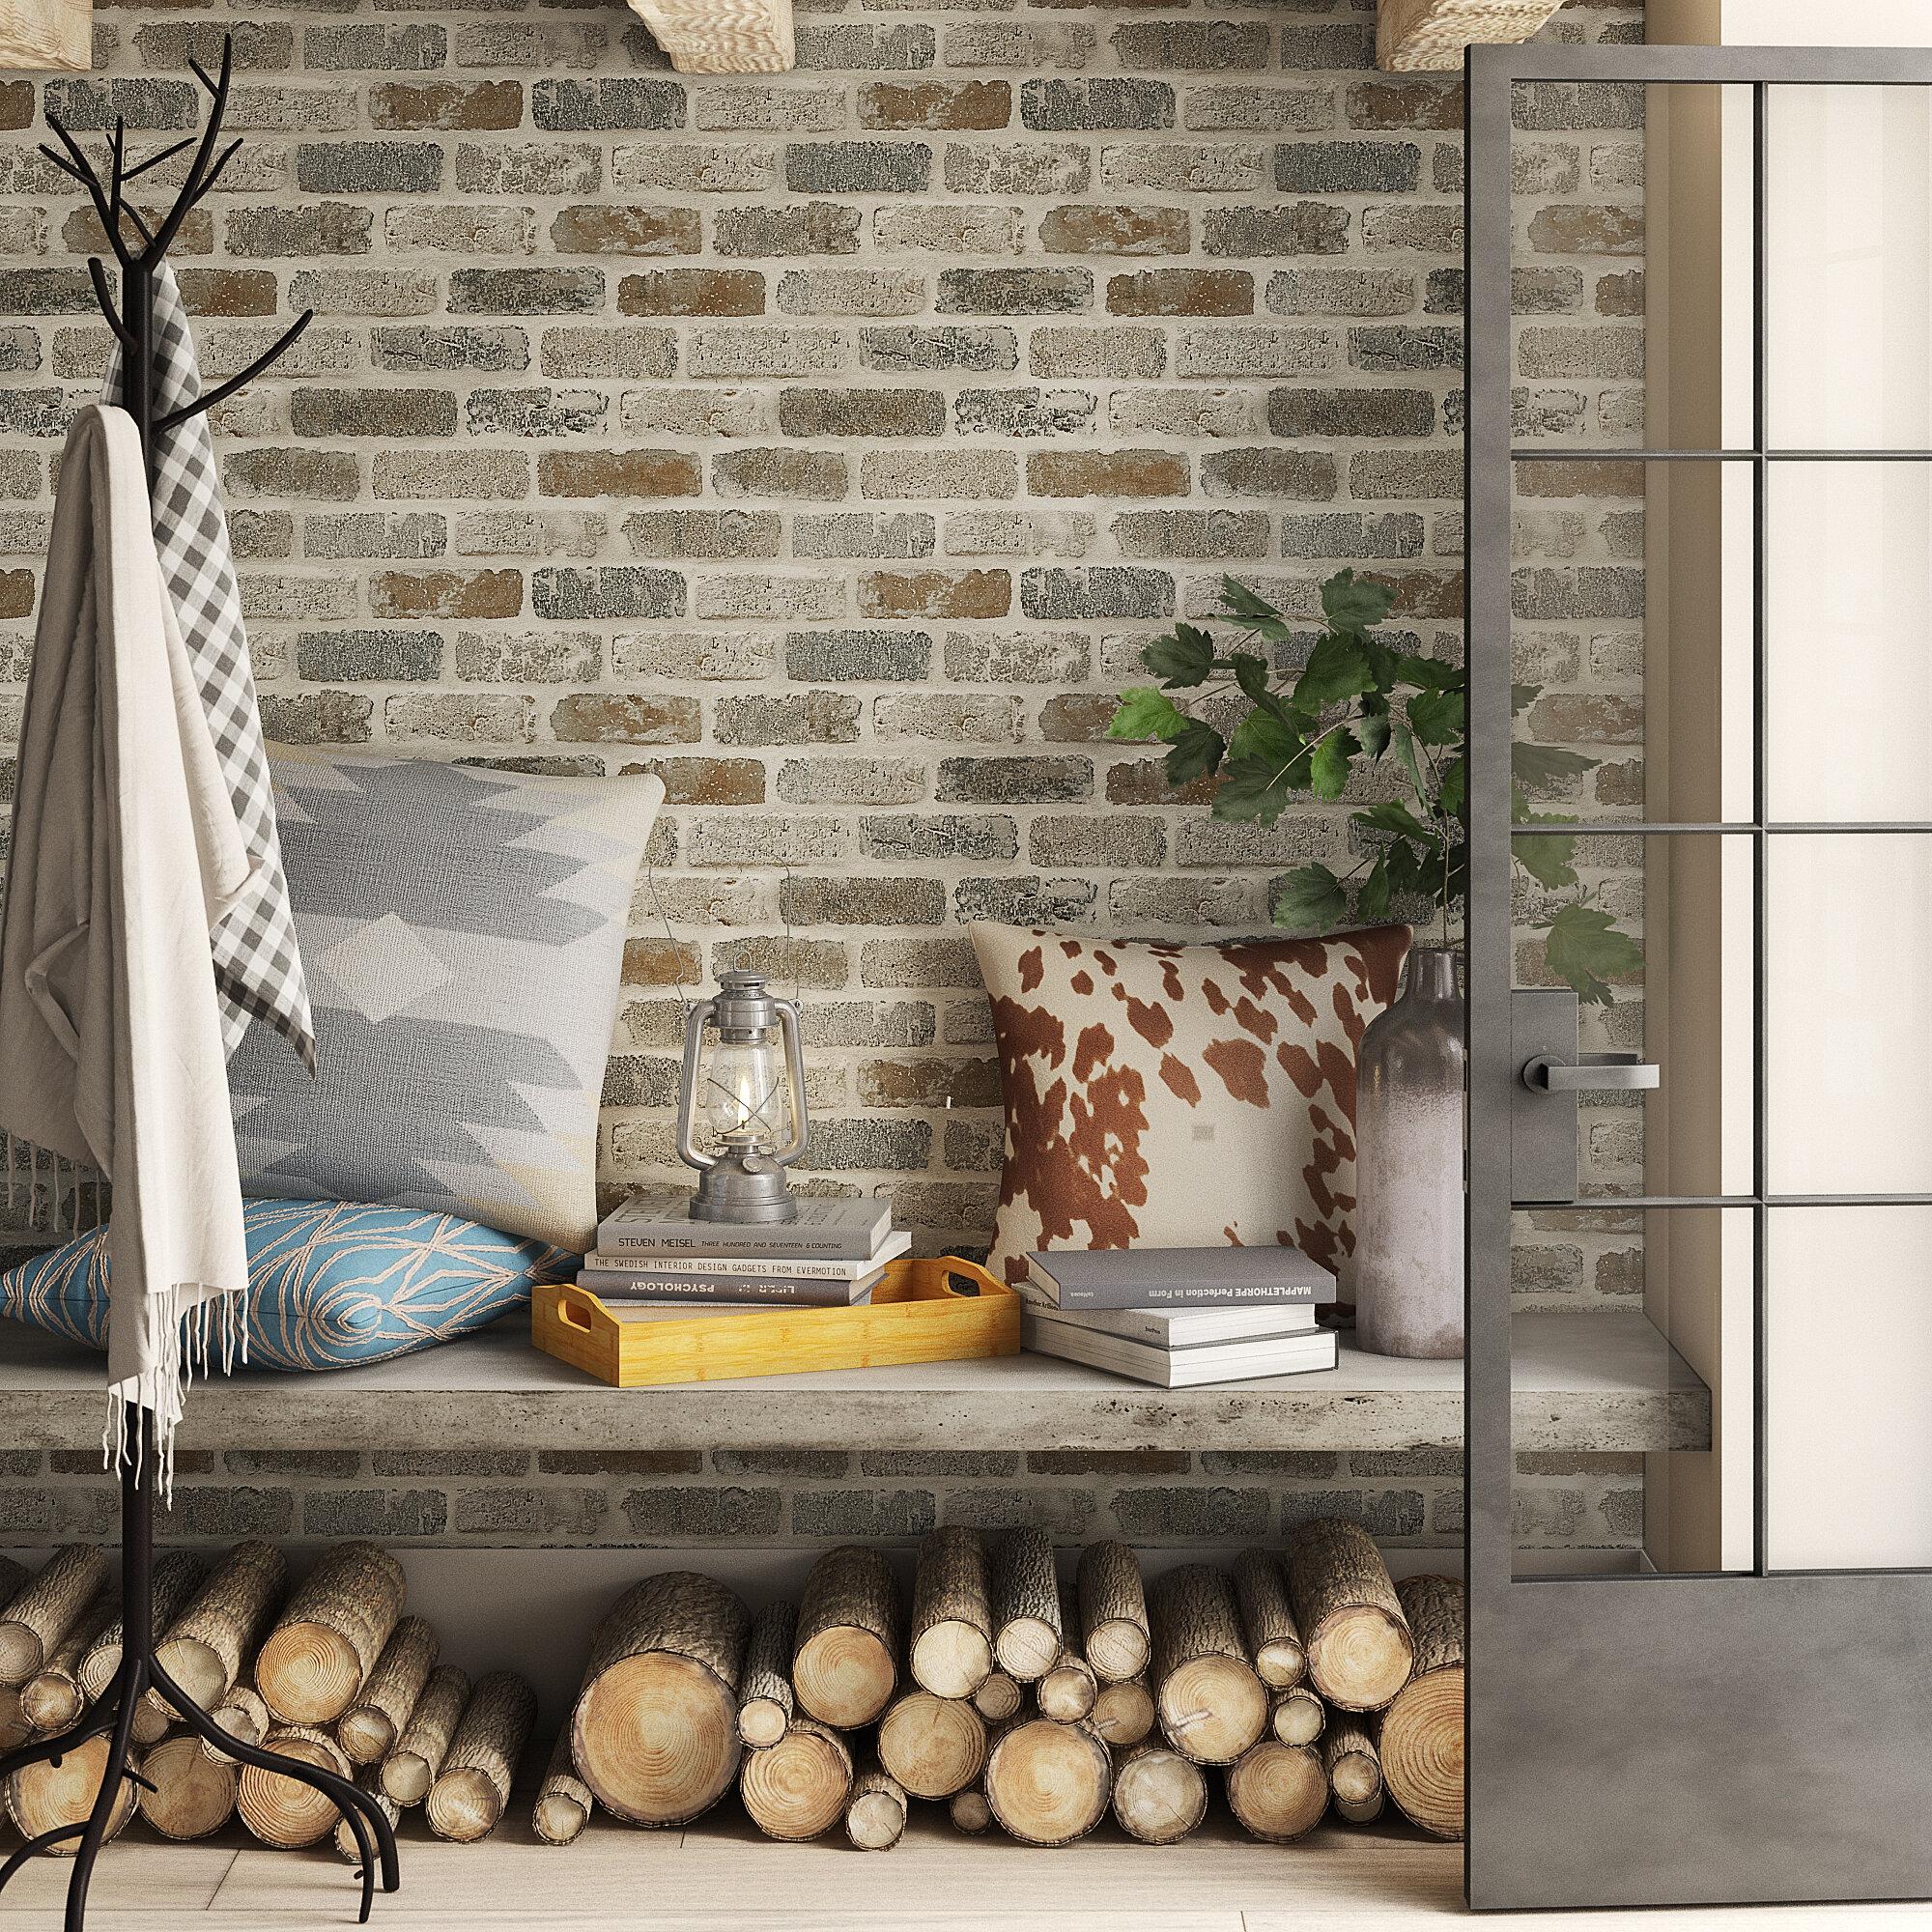 Millwood Pines Dulce Faux Brick 18 L X 20 5 W Peel And Stick Wallpaper Roll Reviews Wayfair